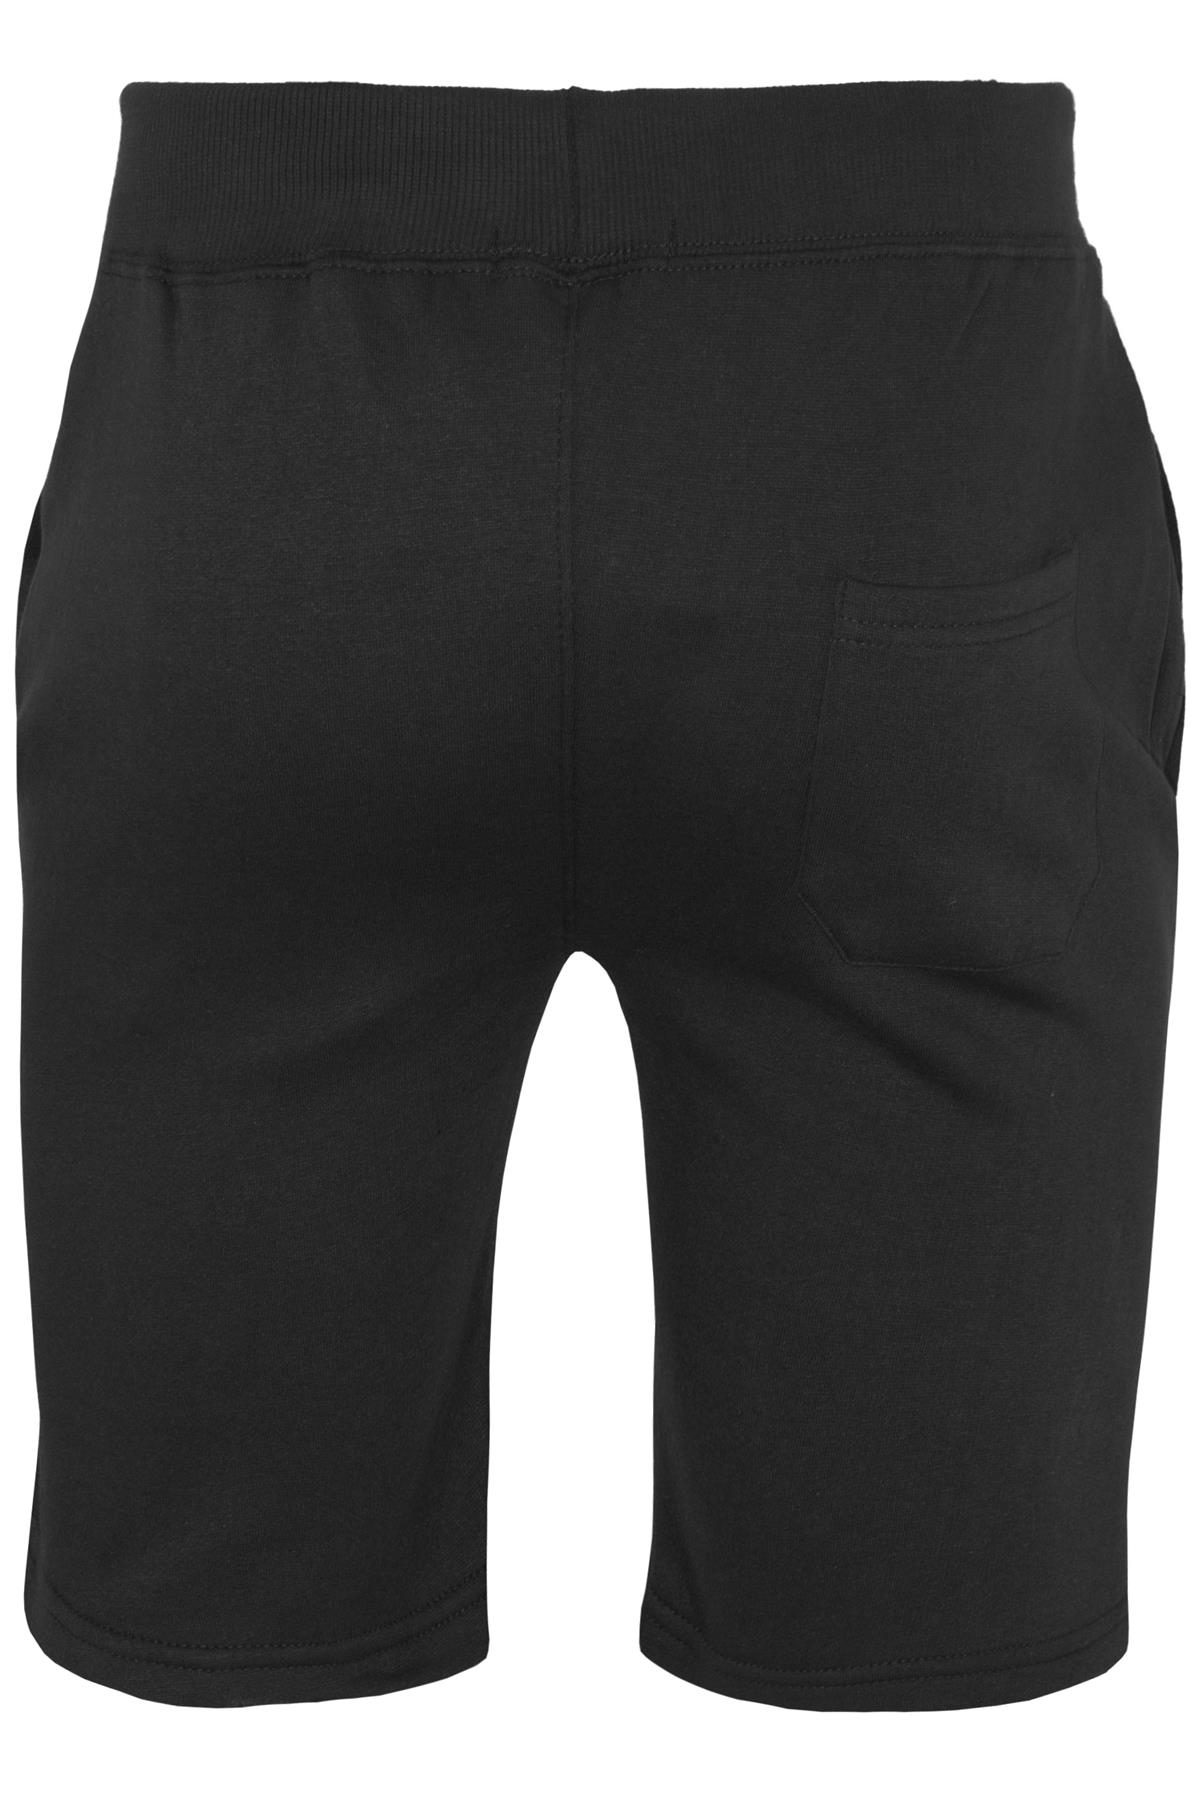 Mens-Contrast-Panel-Running-Summer-Side-Slit-Knee-Length-Fleece-Bottoms-Shorts thumbnail 3